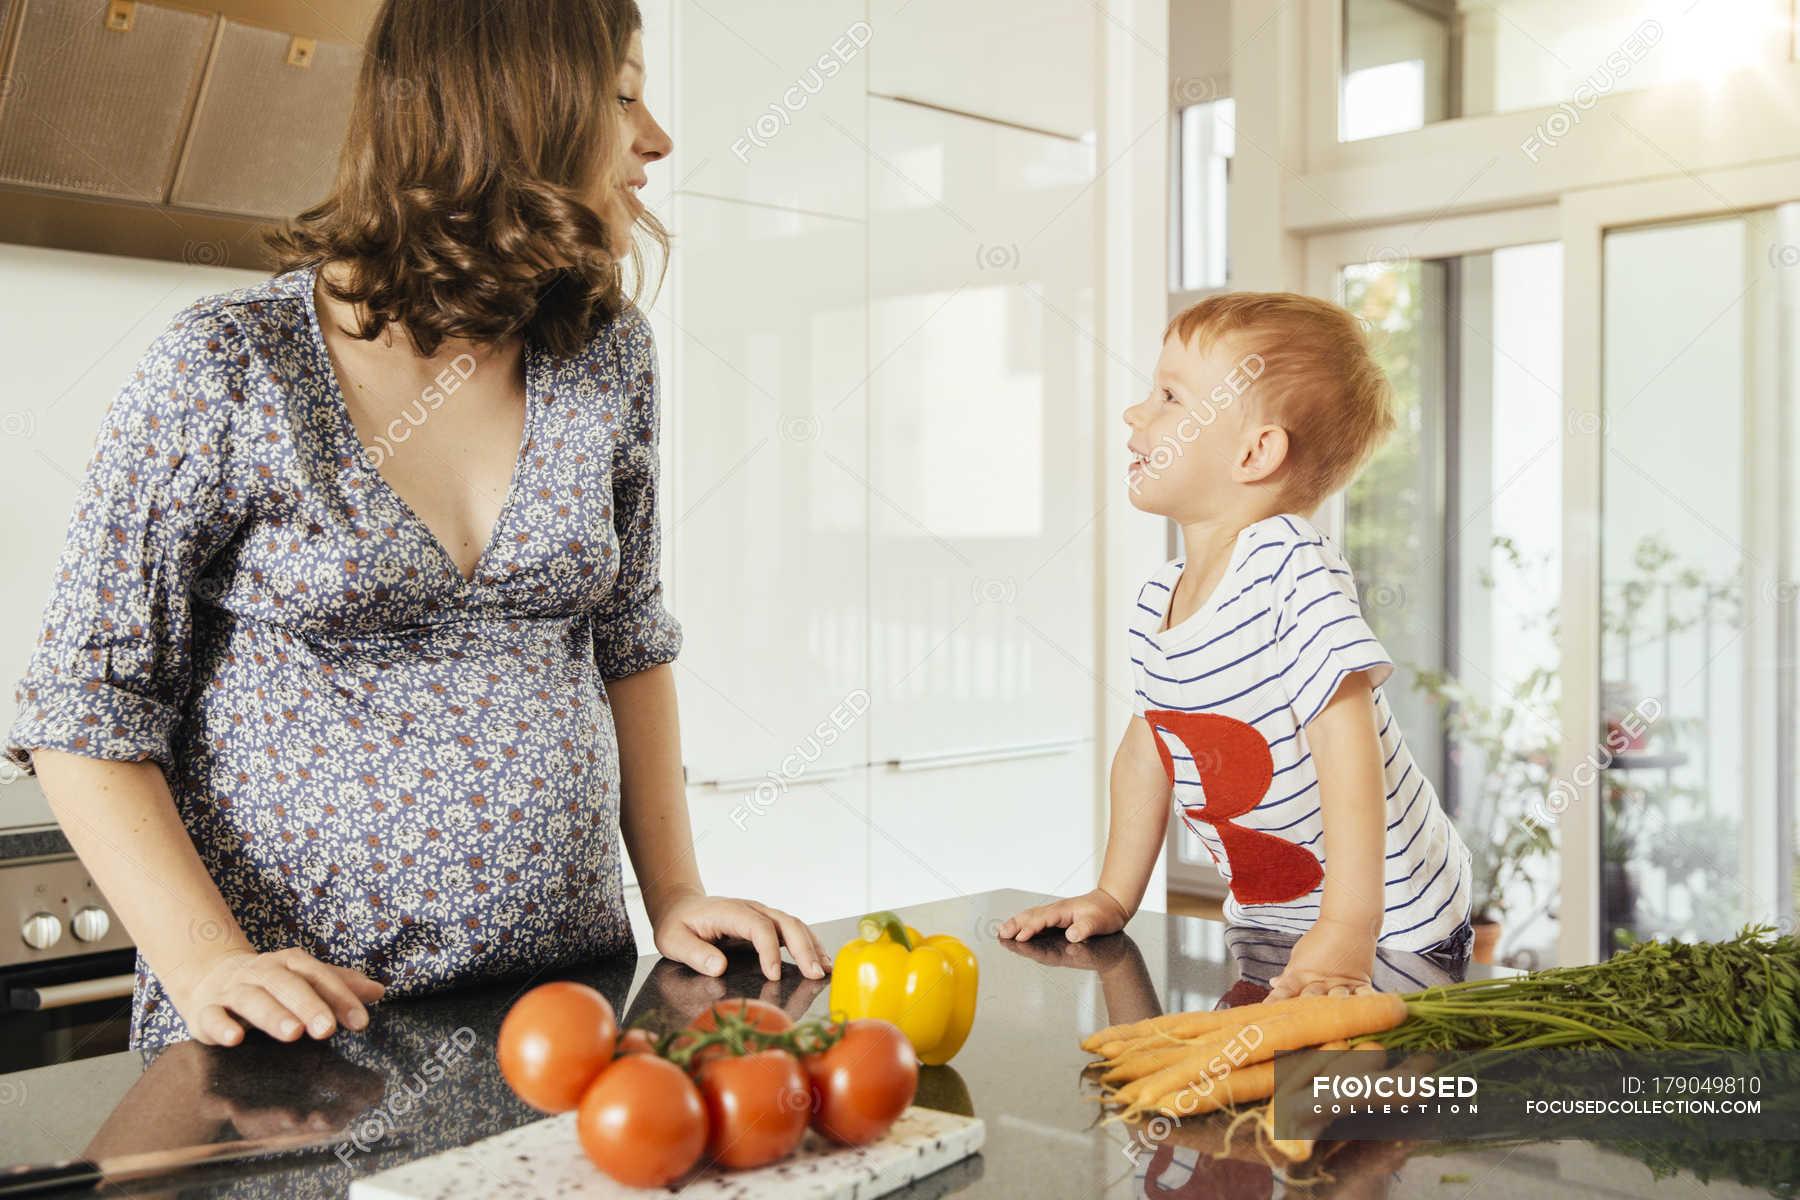 Сын трахнув маму в попу на кухни, Сын ебет маму в жопу на кухне - порно видео онлайн 11 фотография